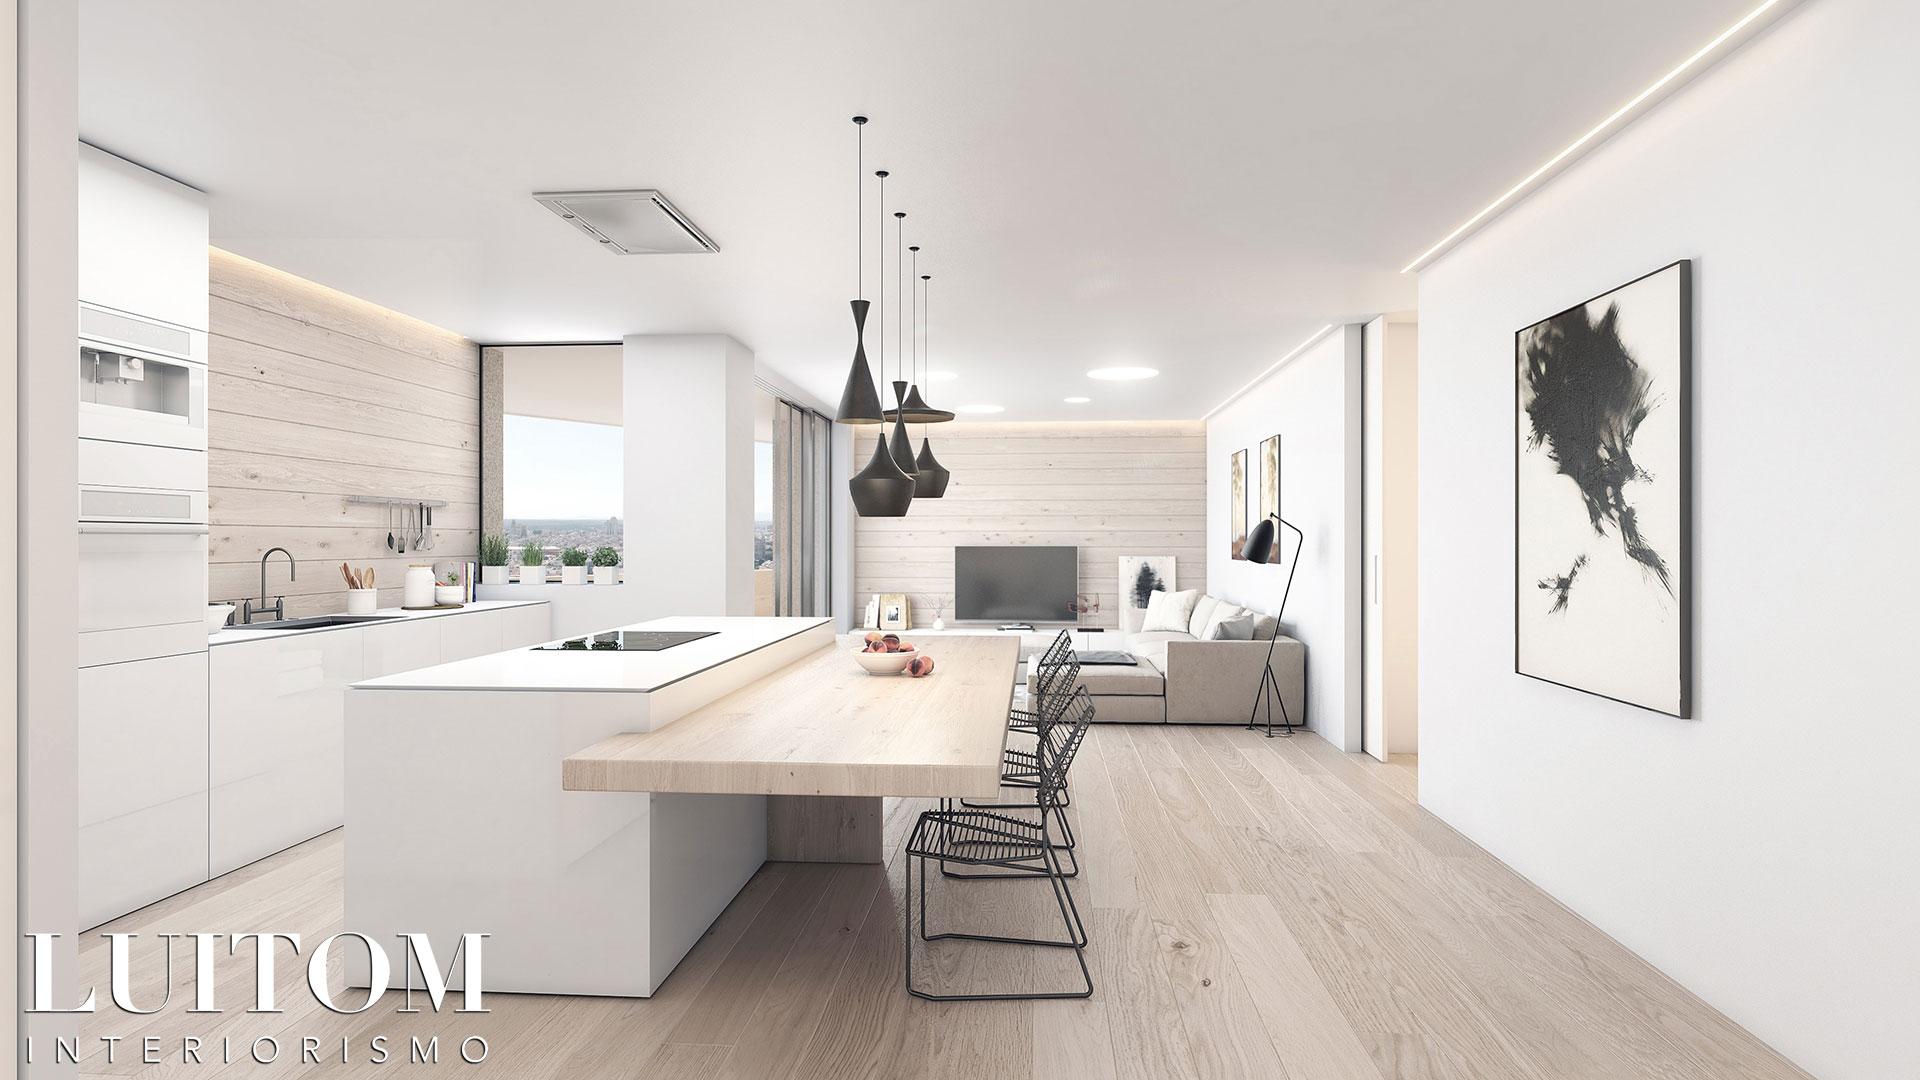 ideas-reformas-casas-lujo-interiorismo-decoracion-viviendas-luxury-home-living-kitchen-interior-design-60